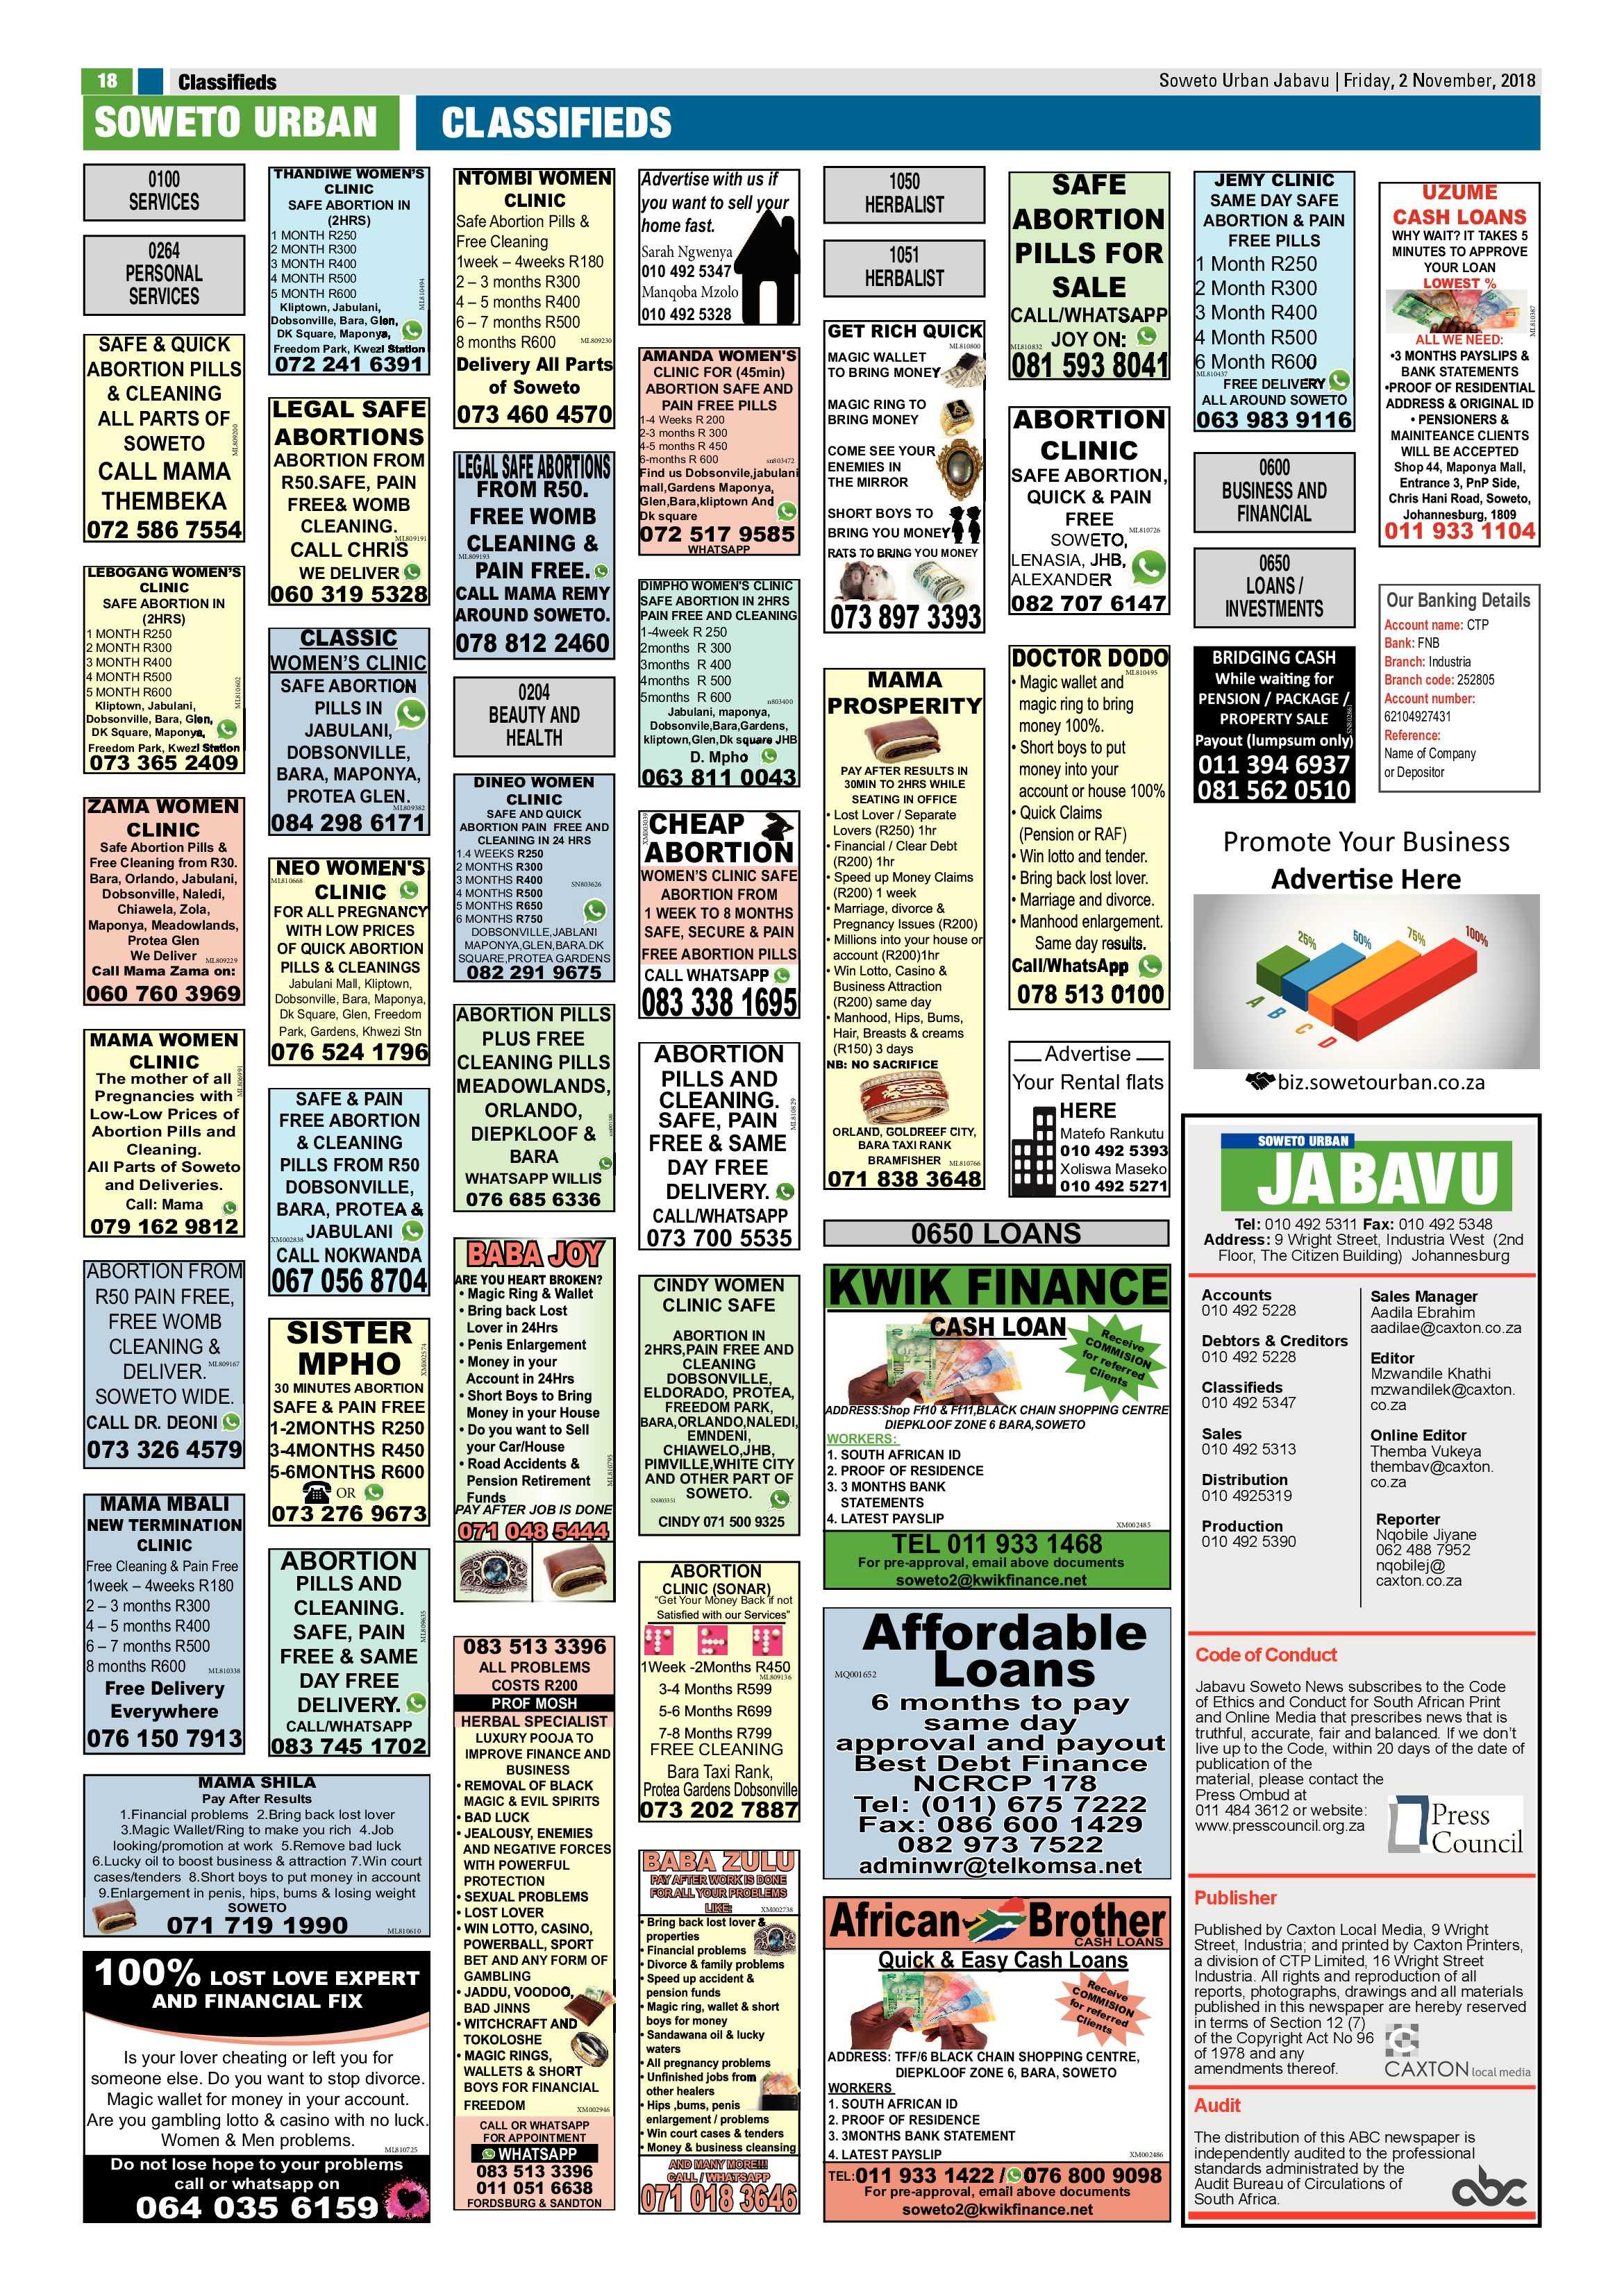 jabavu-november-2-2018-issue-epapers-page-18